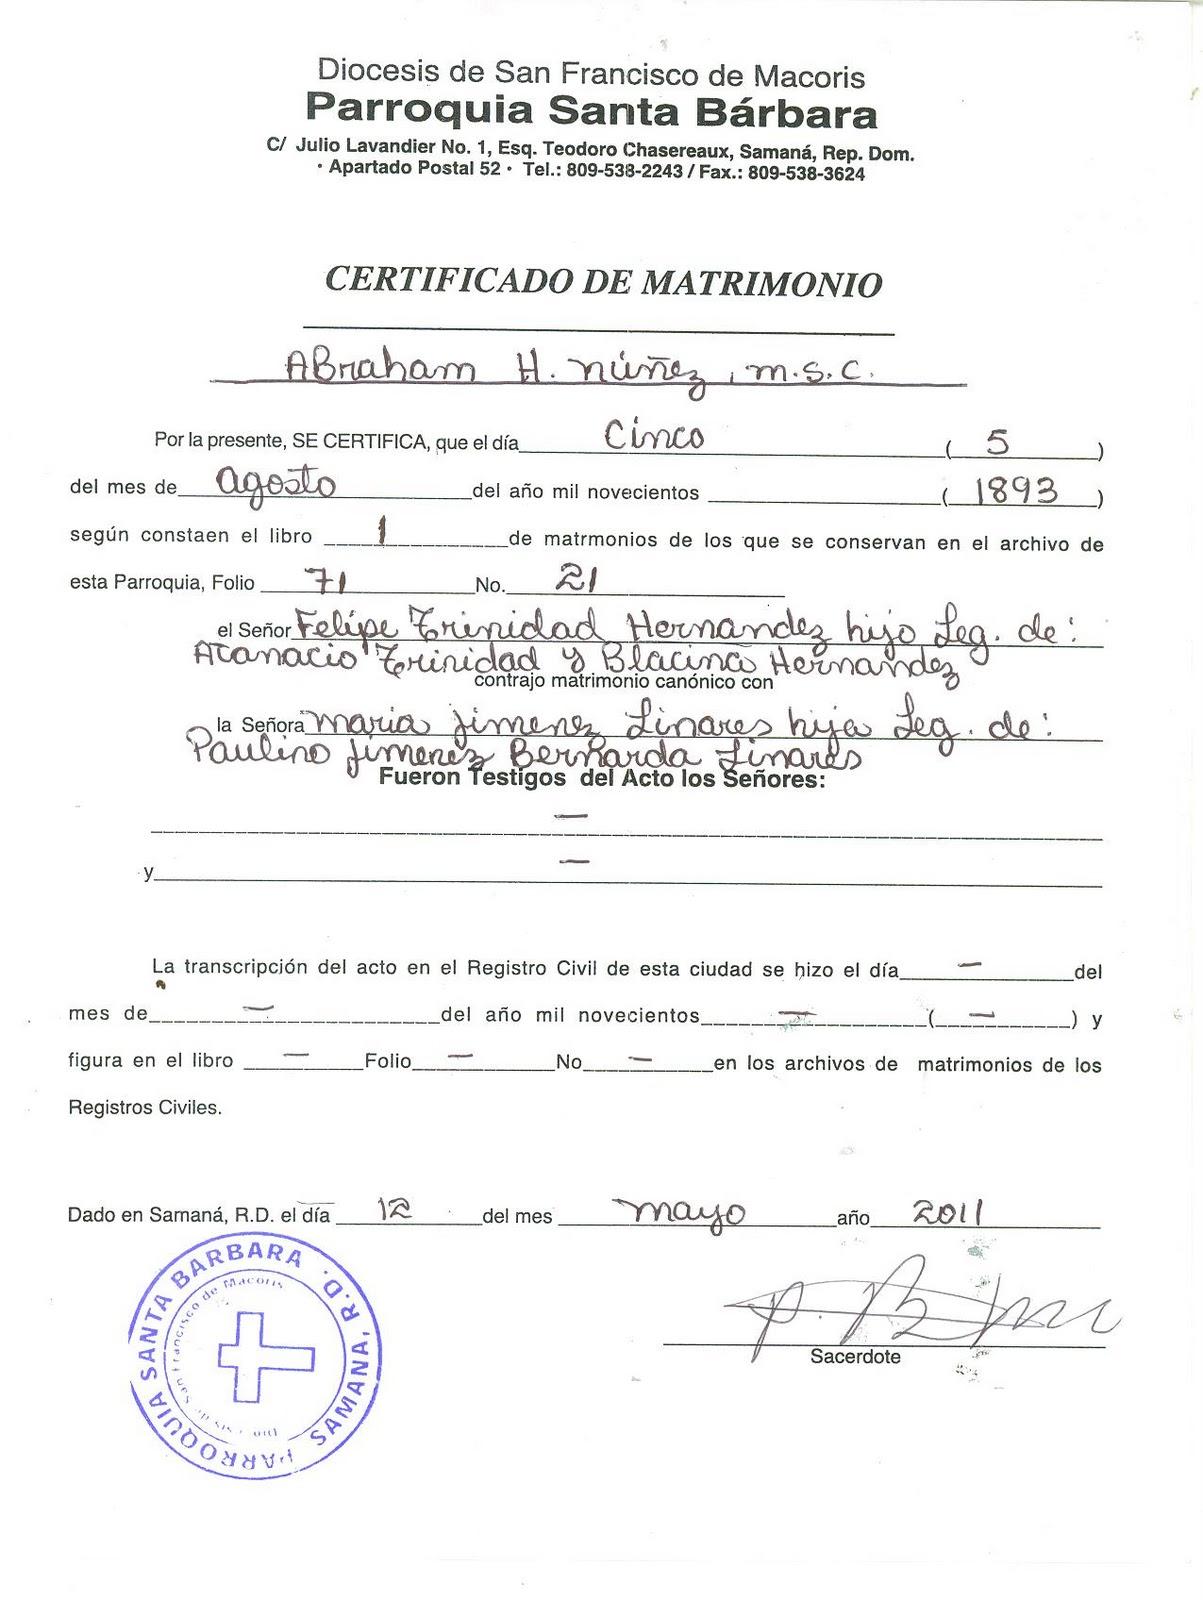 Matrimonio Catolico Sin Confirmacion : Mi pais acta de matrimonio victoriano y felipe